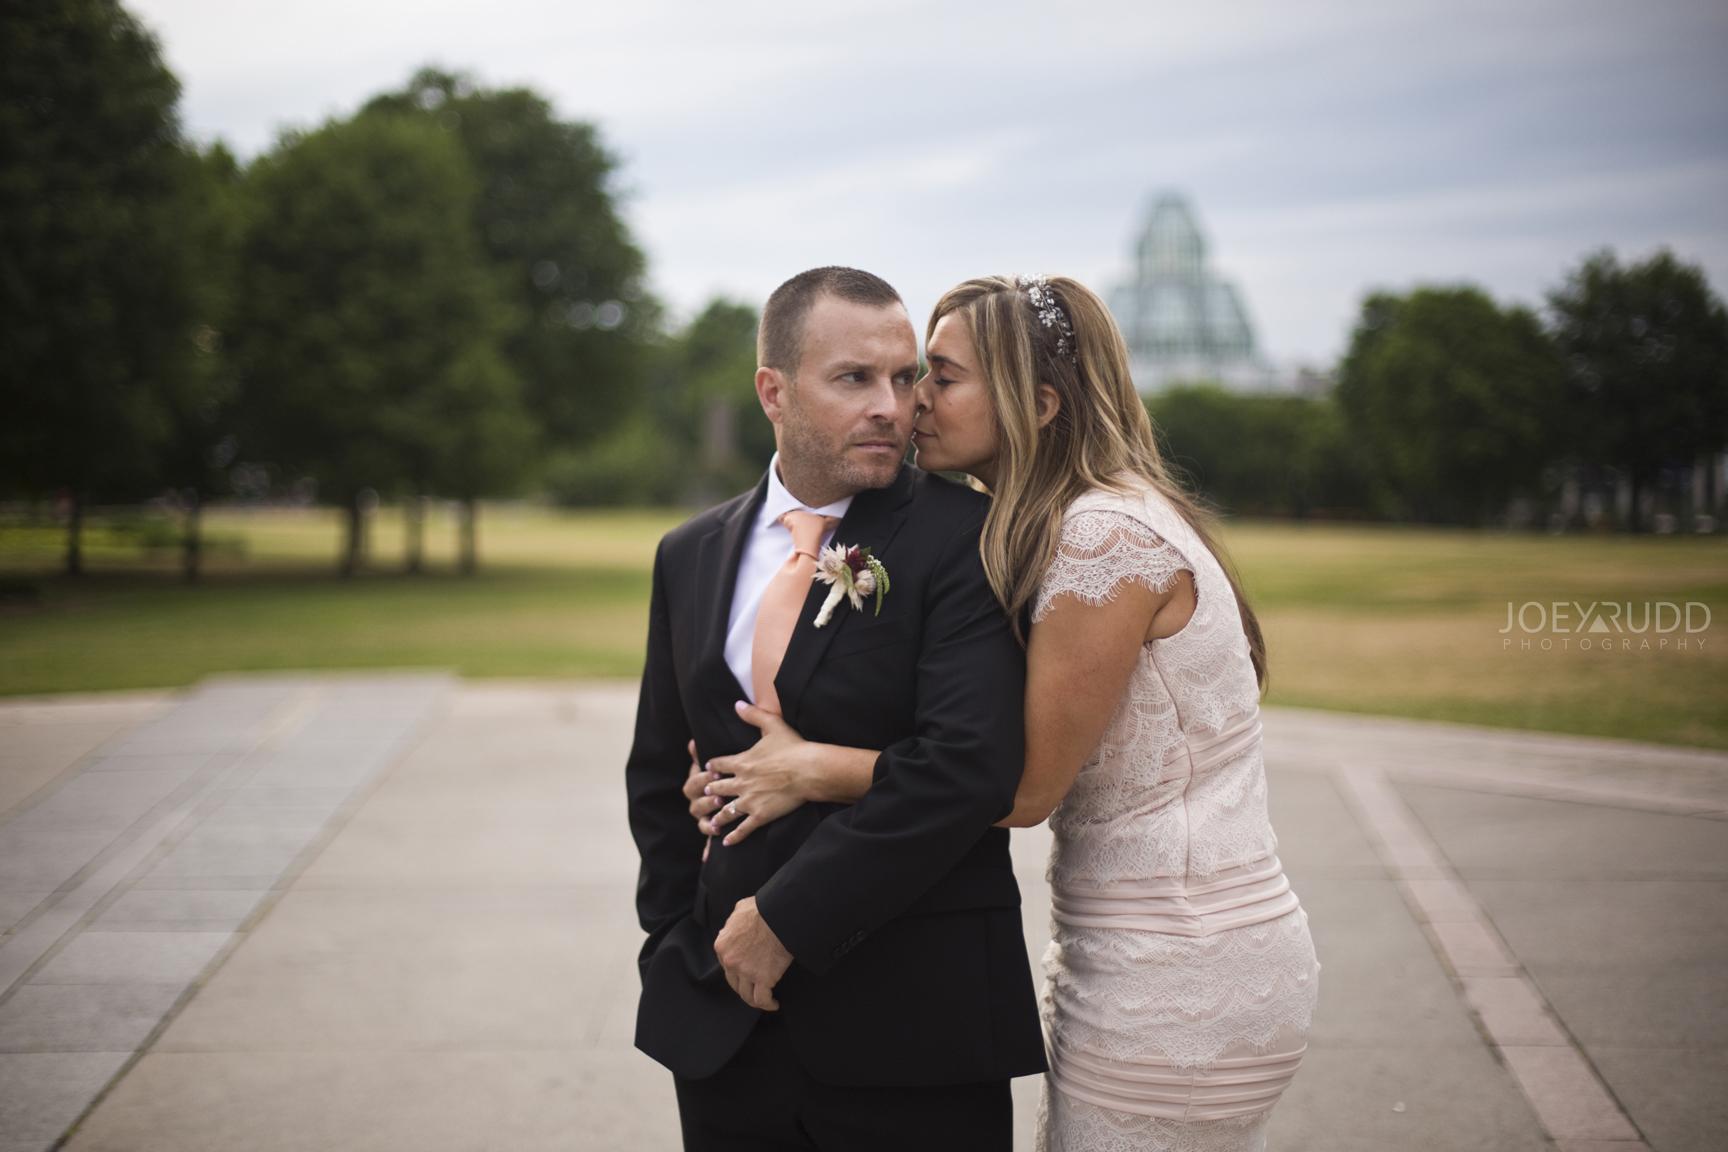 Elopement Wedding by Ottawa Wedding Photographer Joey Rudd Photography Majors Hill Art Gallery